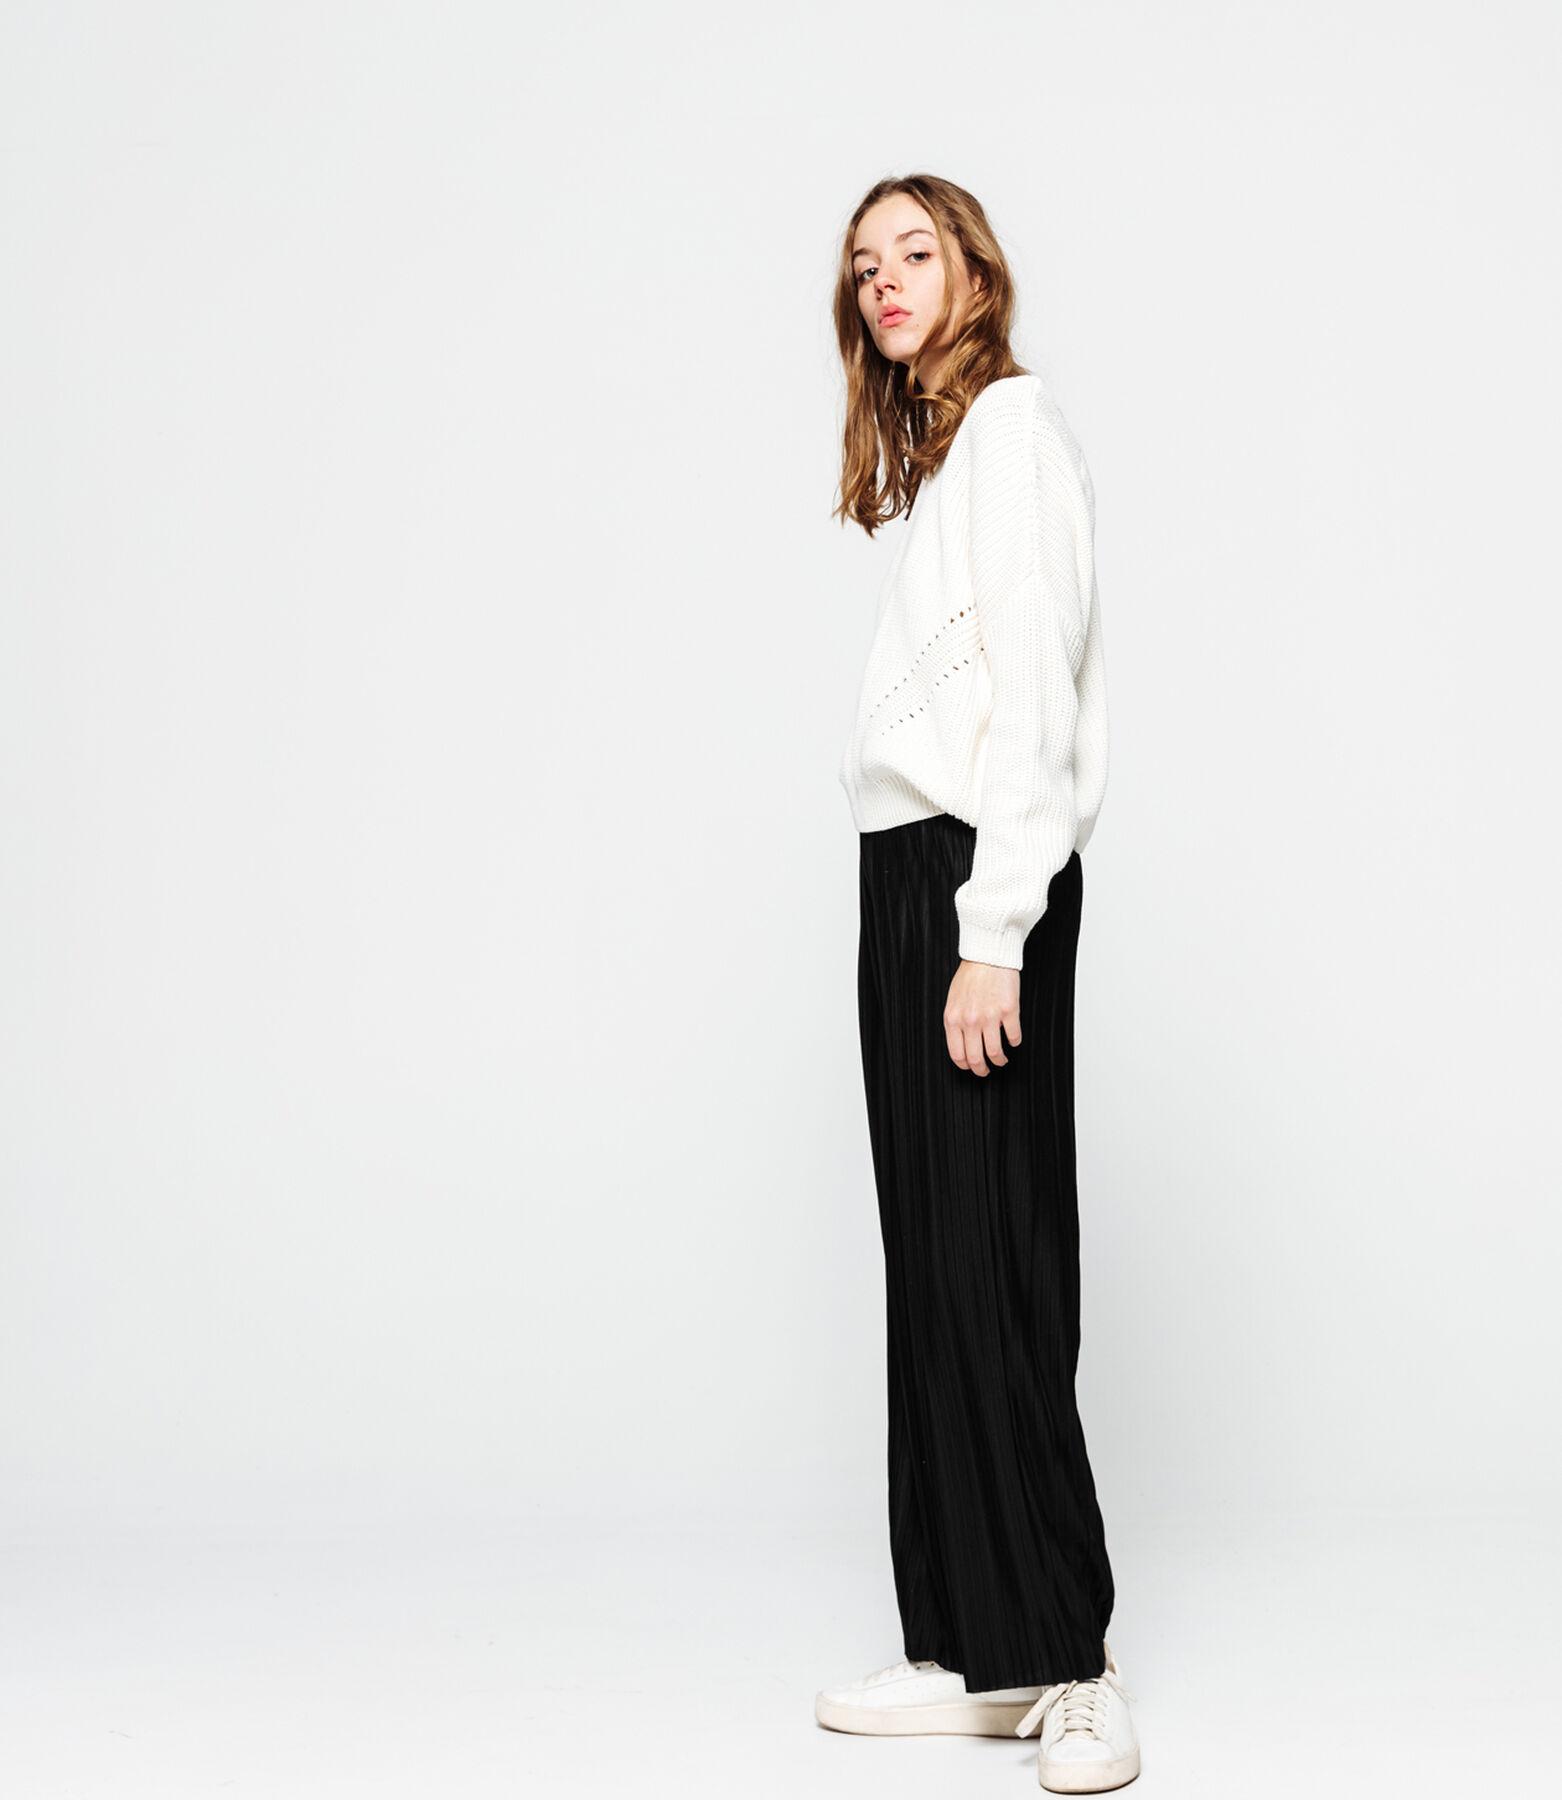 Pantalon plissé large